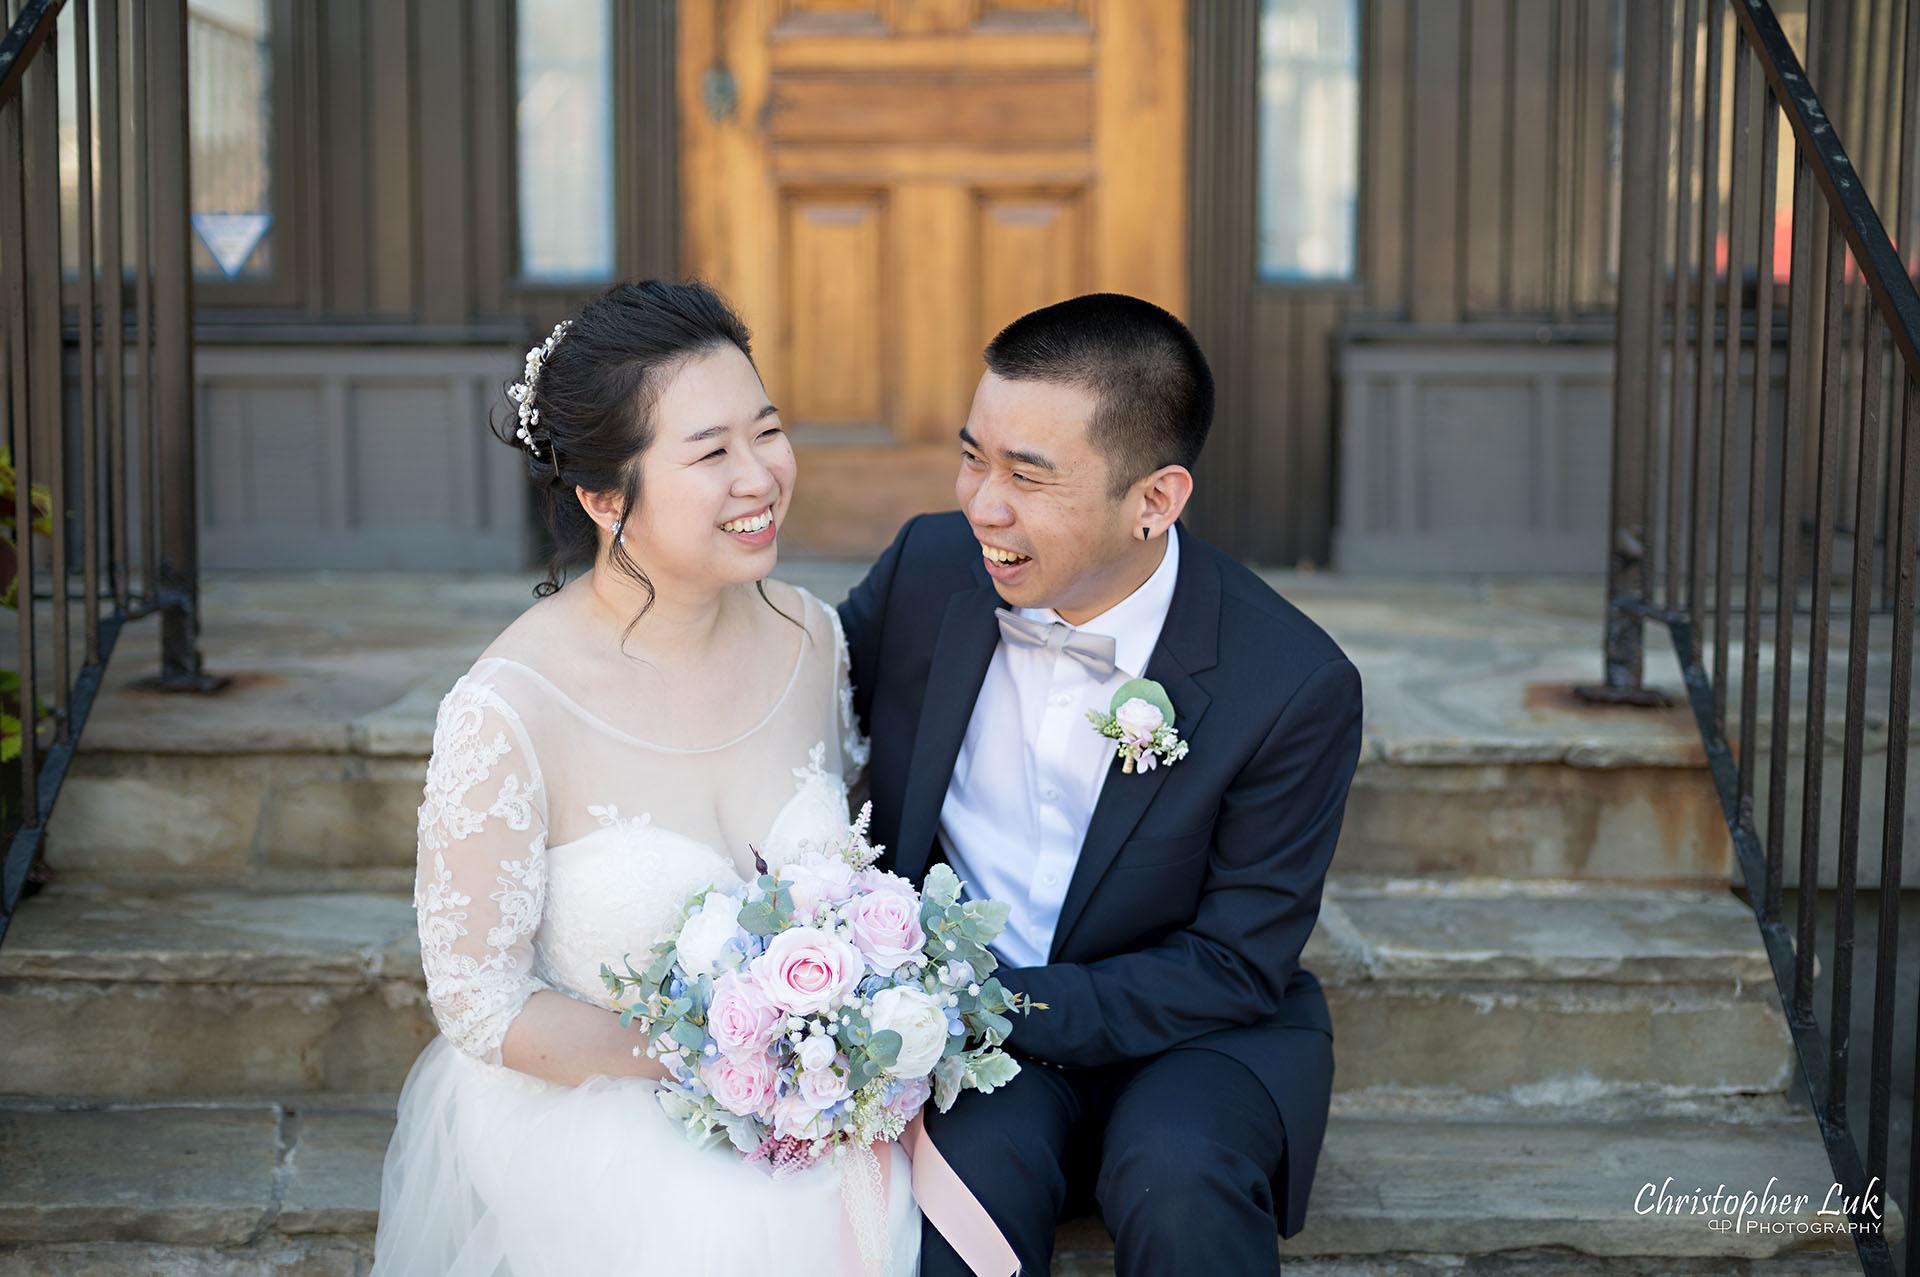 Doctor's House Chapel Micro Wedding